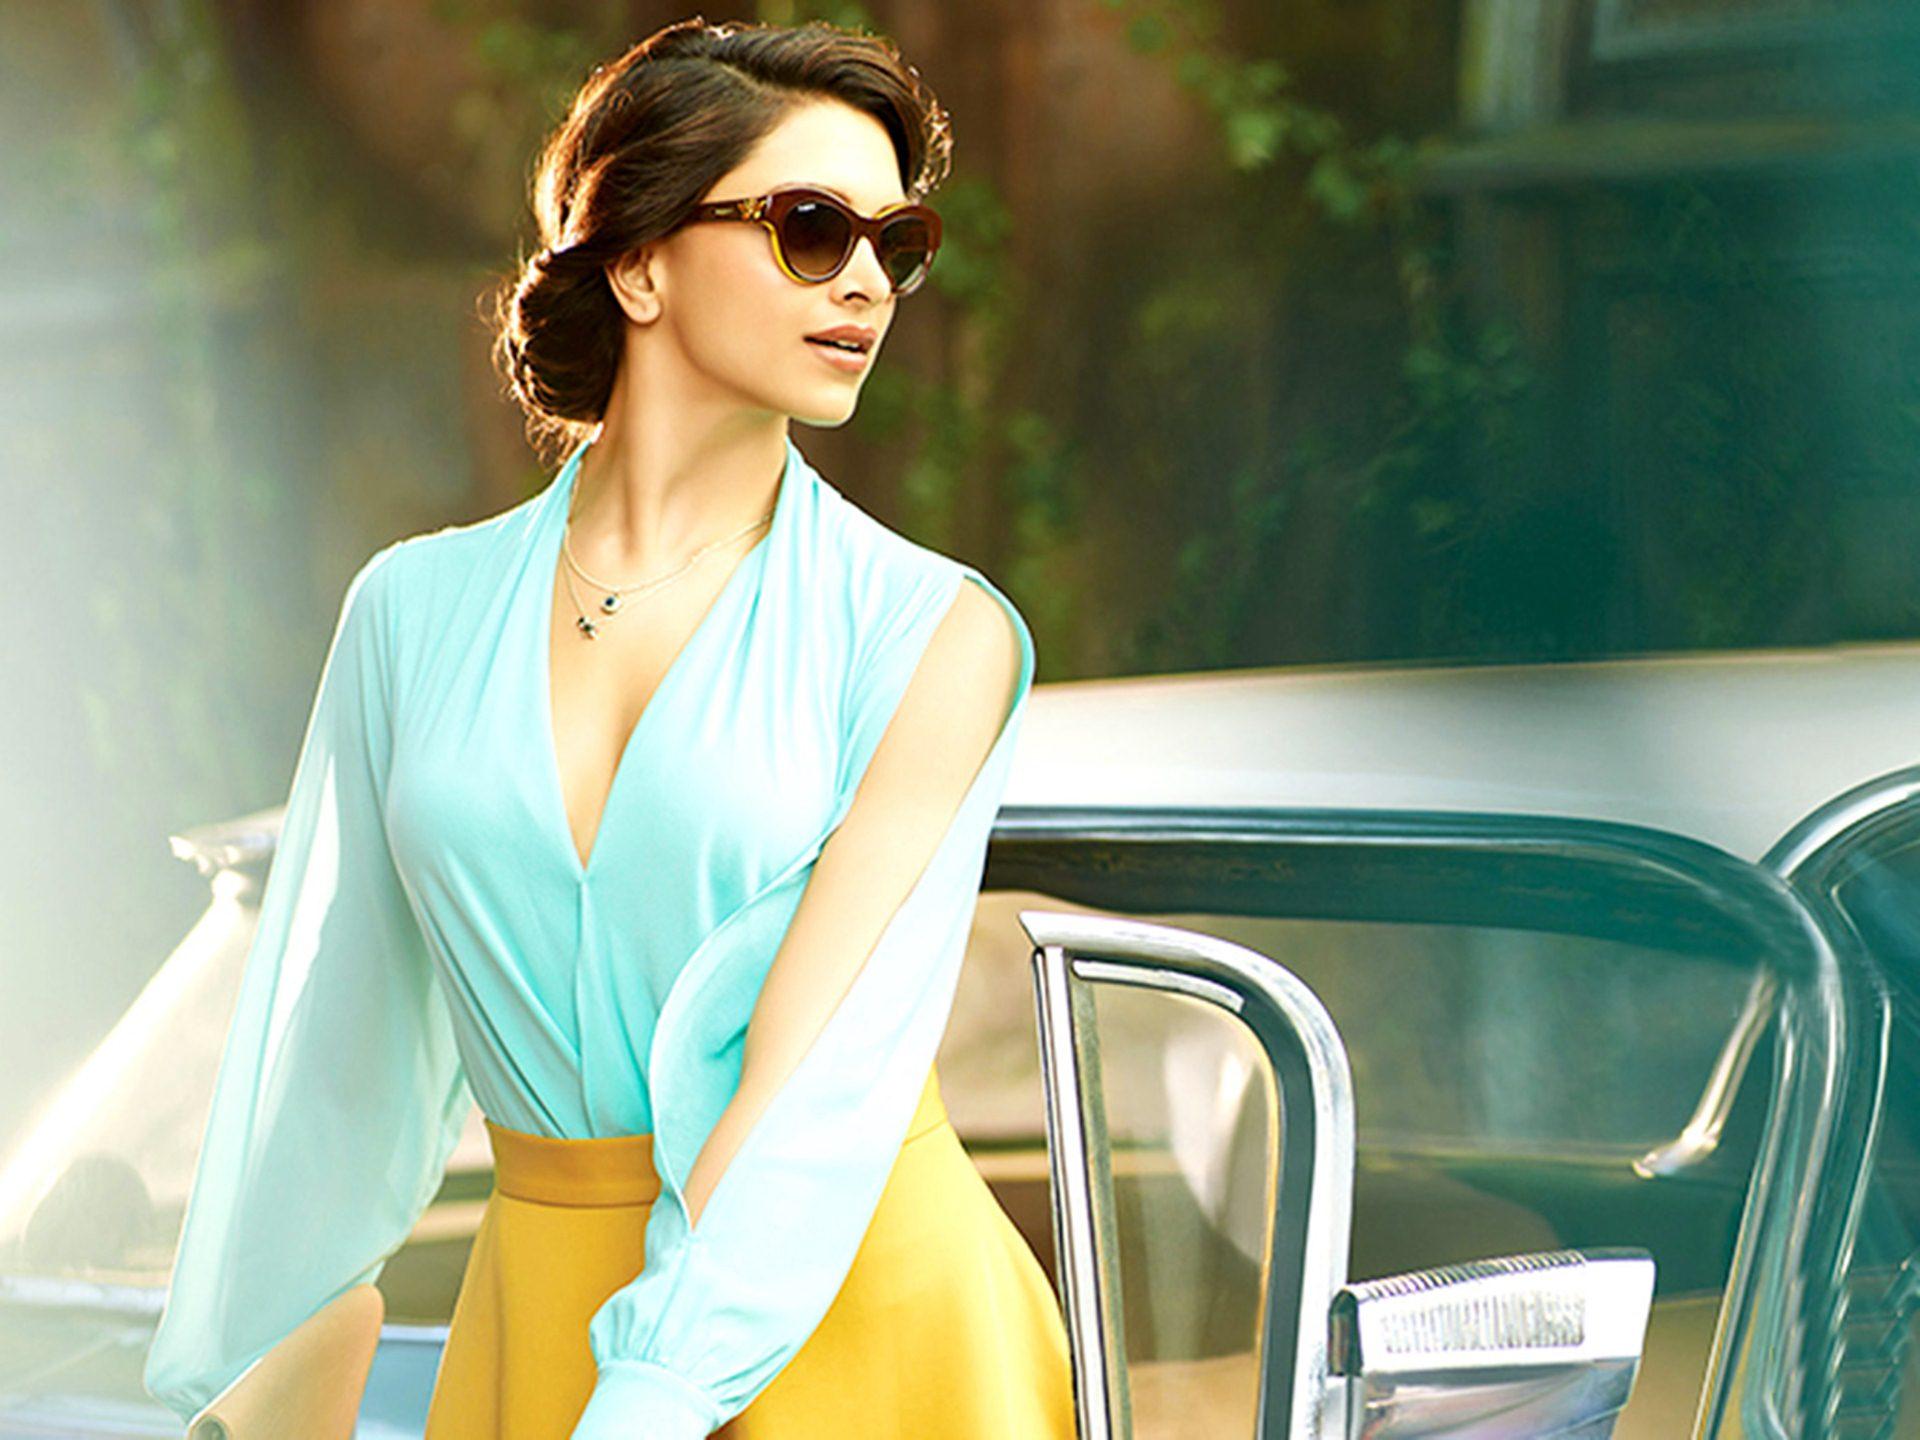 Deepika Padukone Photo Gallery From Vogue - Deepika Padukone In Sunglasses  - 1920x1440 - Download HD Wallpaper - WallpaperTip